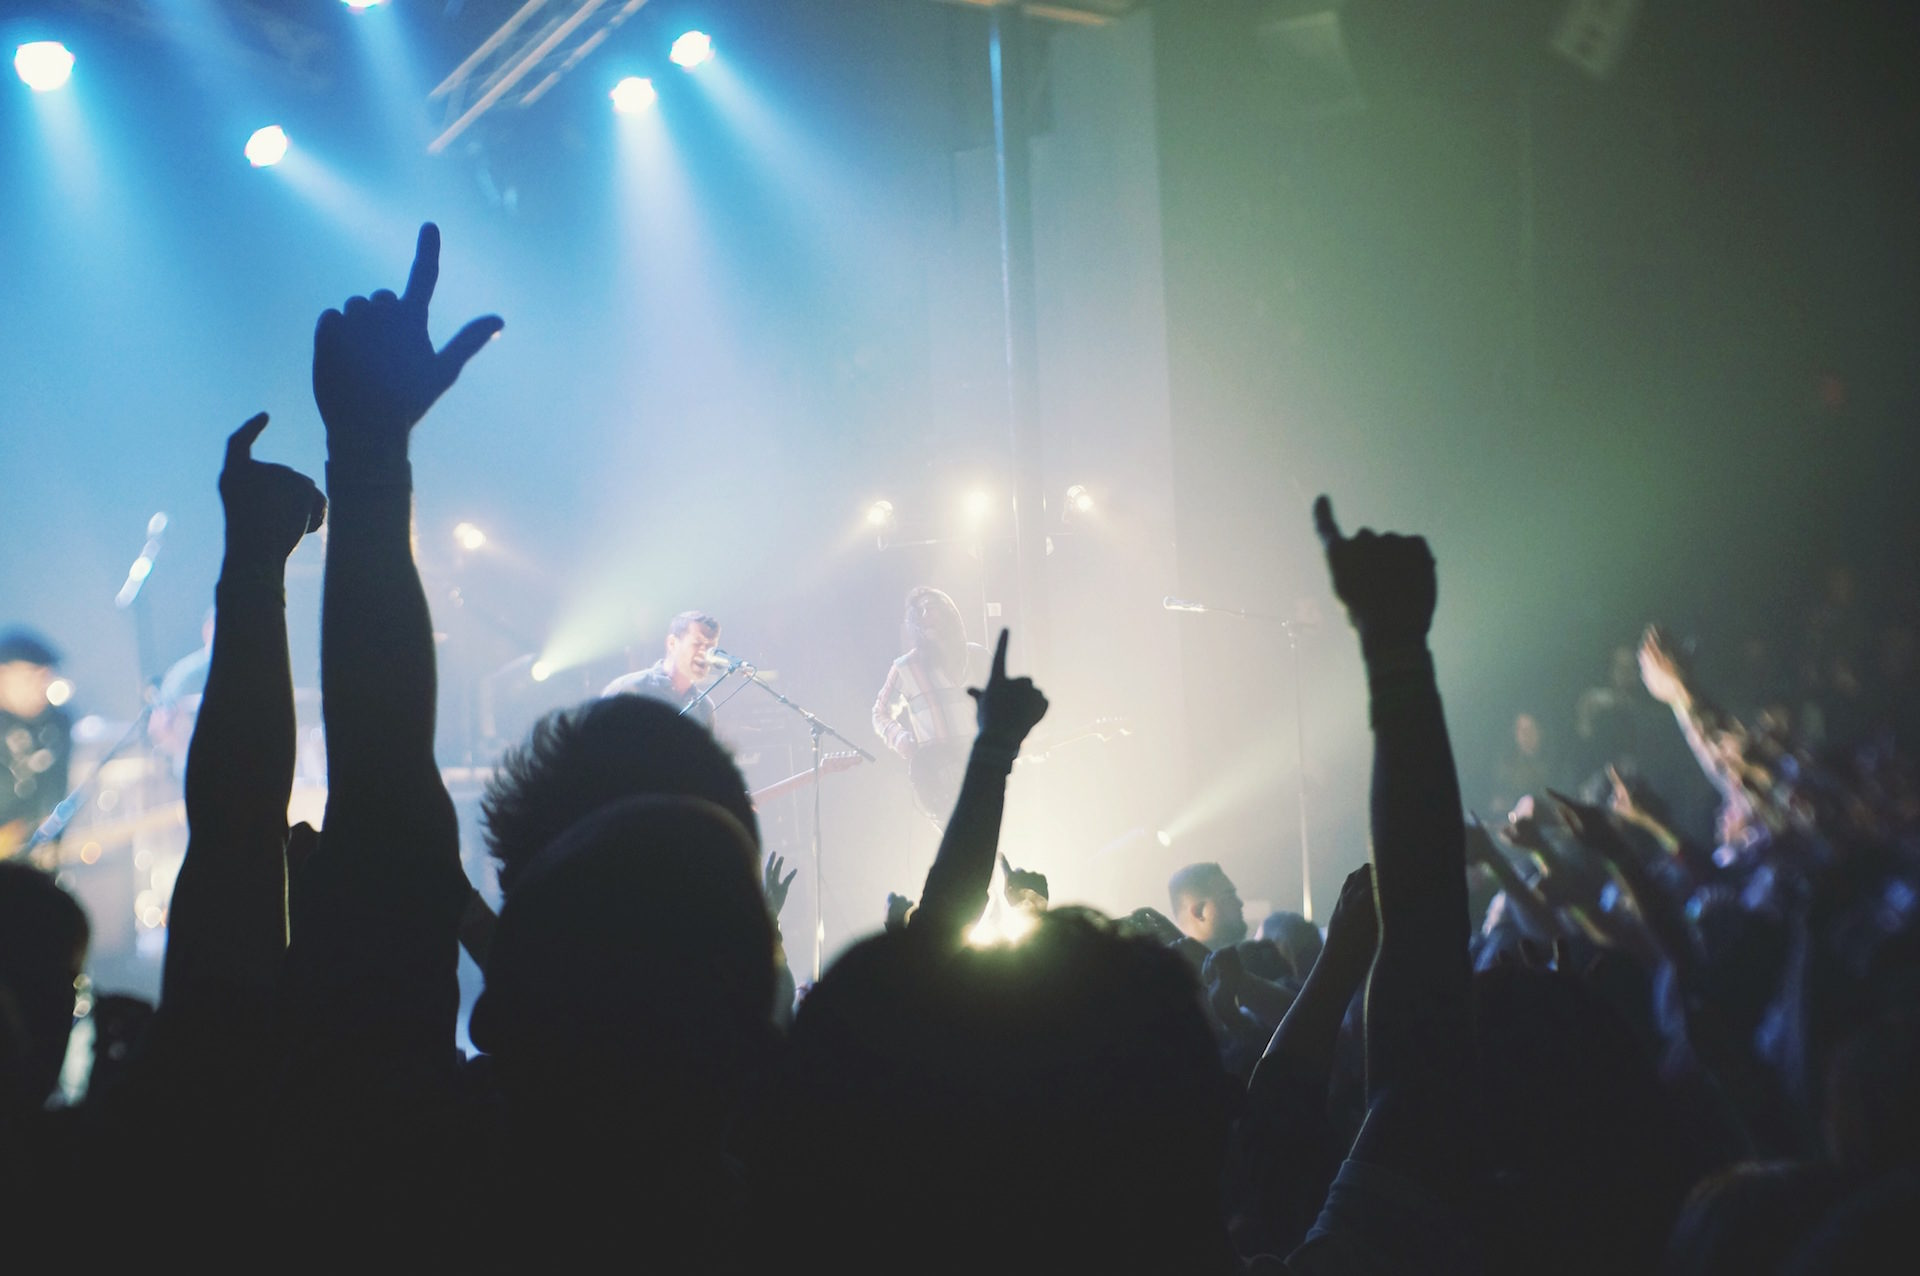 संगीत कार्यक्रम, diversión, हाथ, cantante, नृत्य - HD वॉलपेपर - प्रोफेसर-falken.com